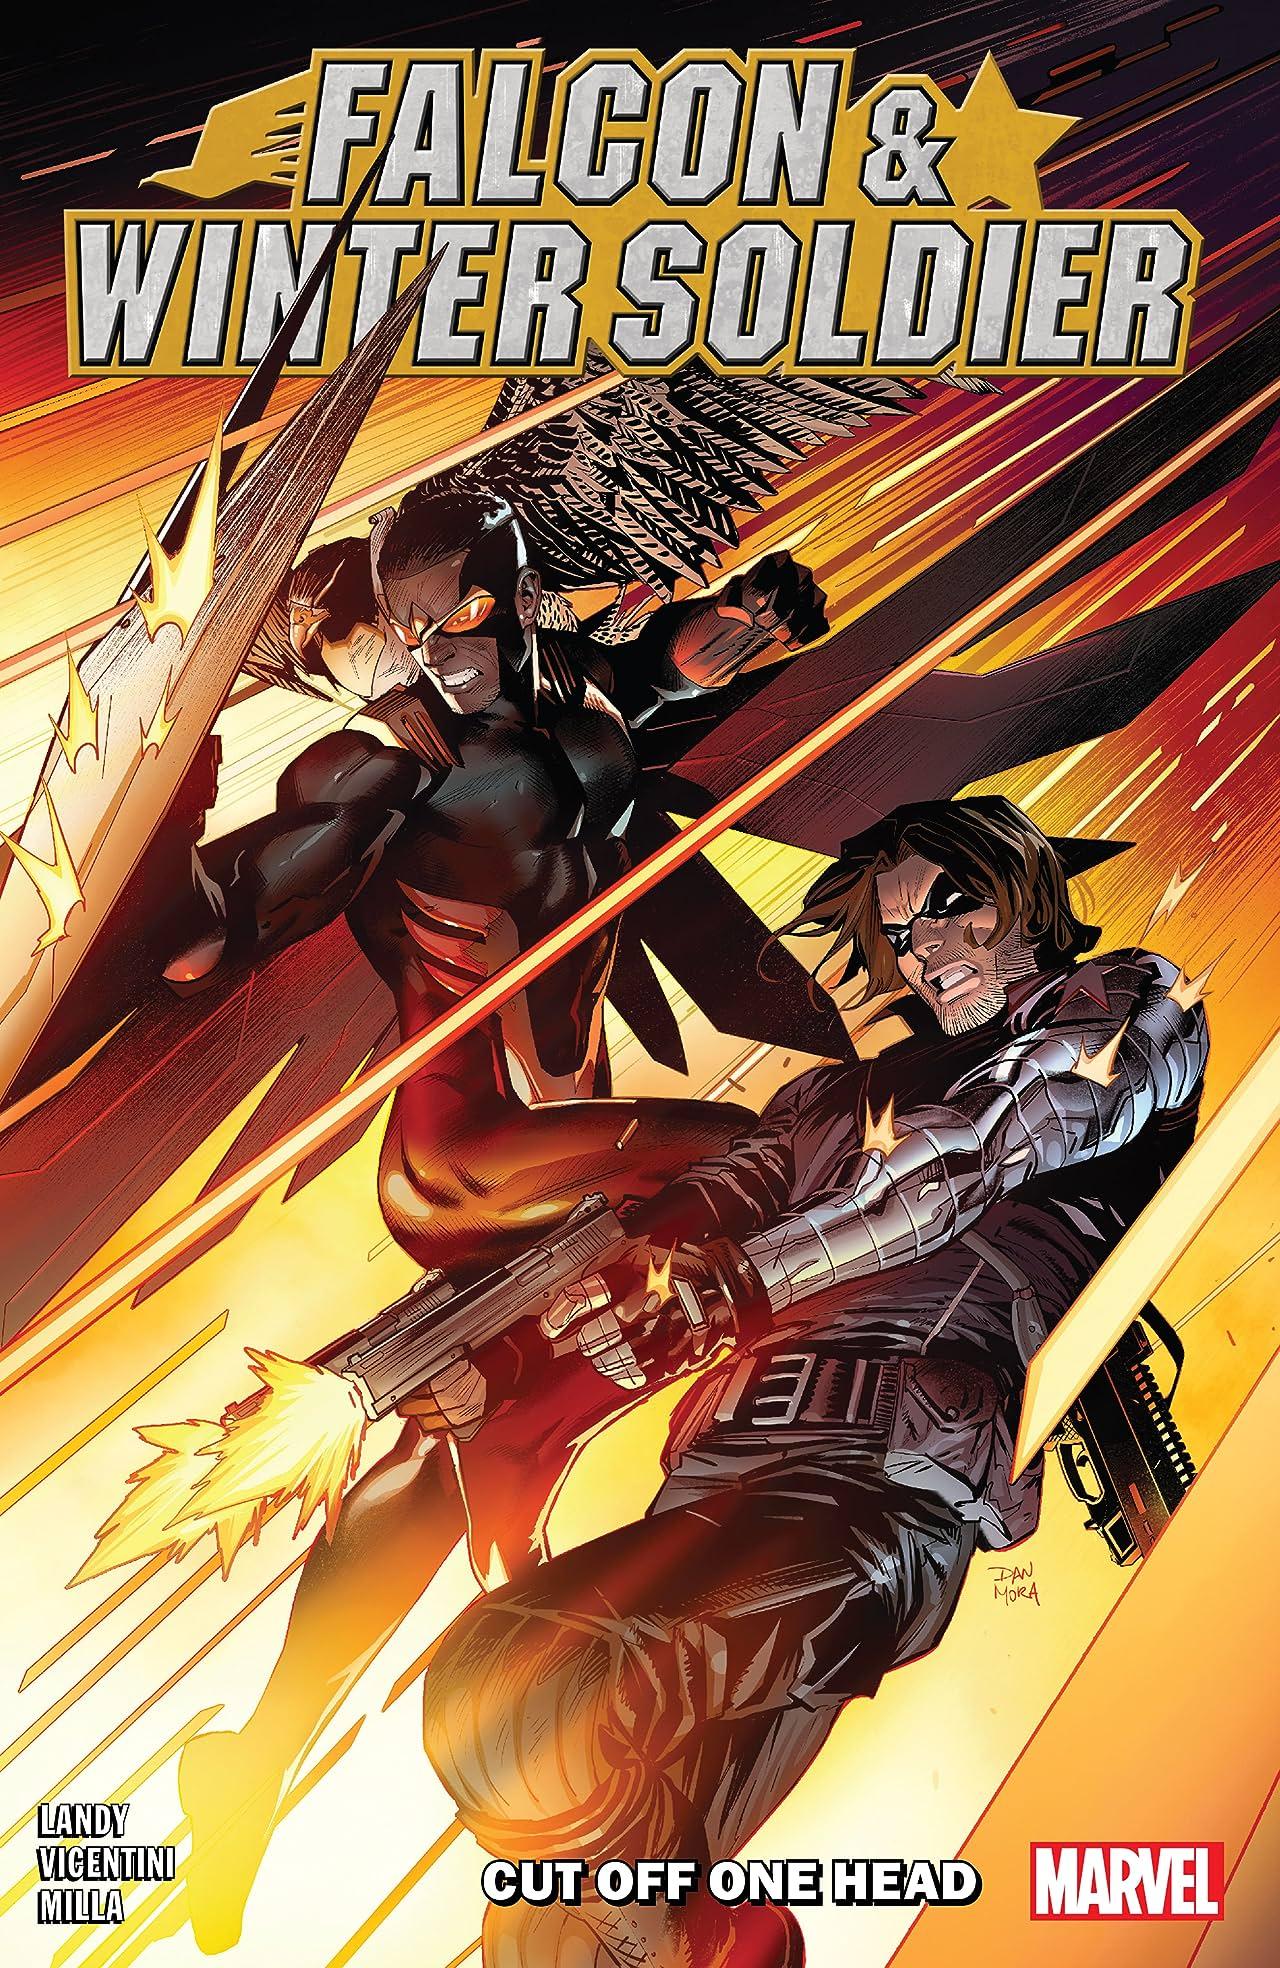 Falcon & Winter Soldier: Cut Off One Head